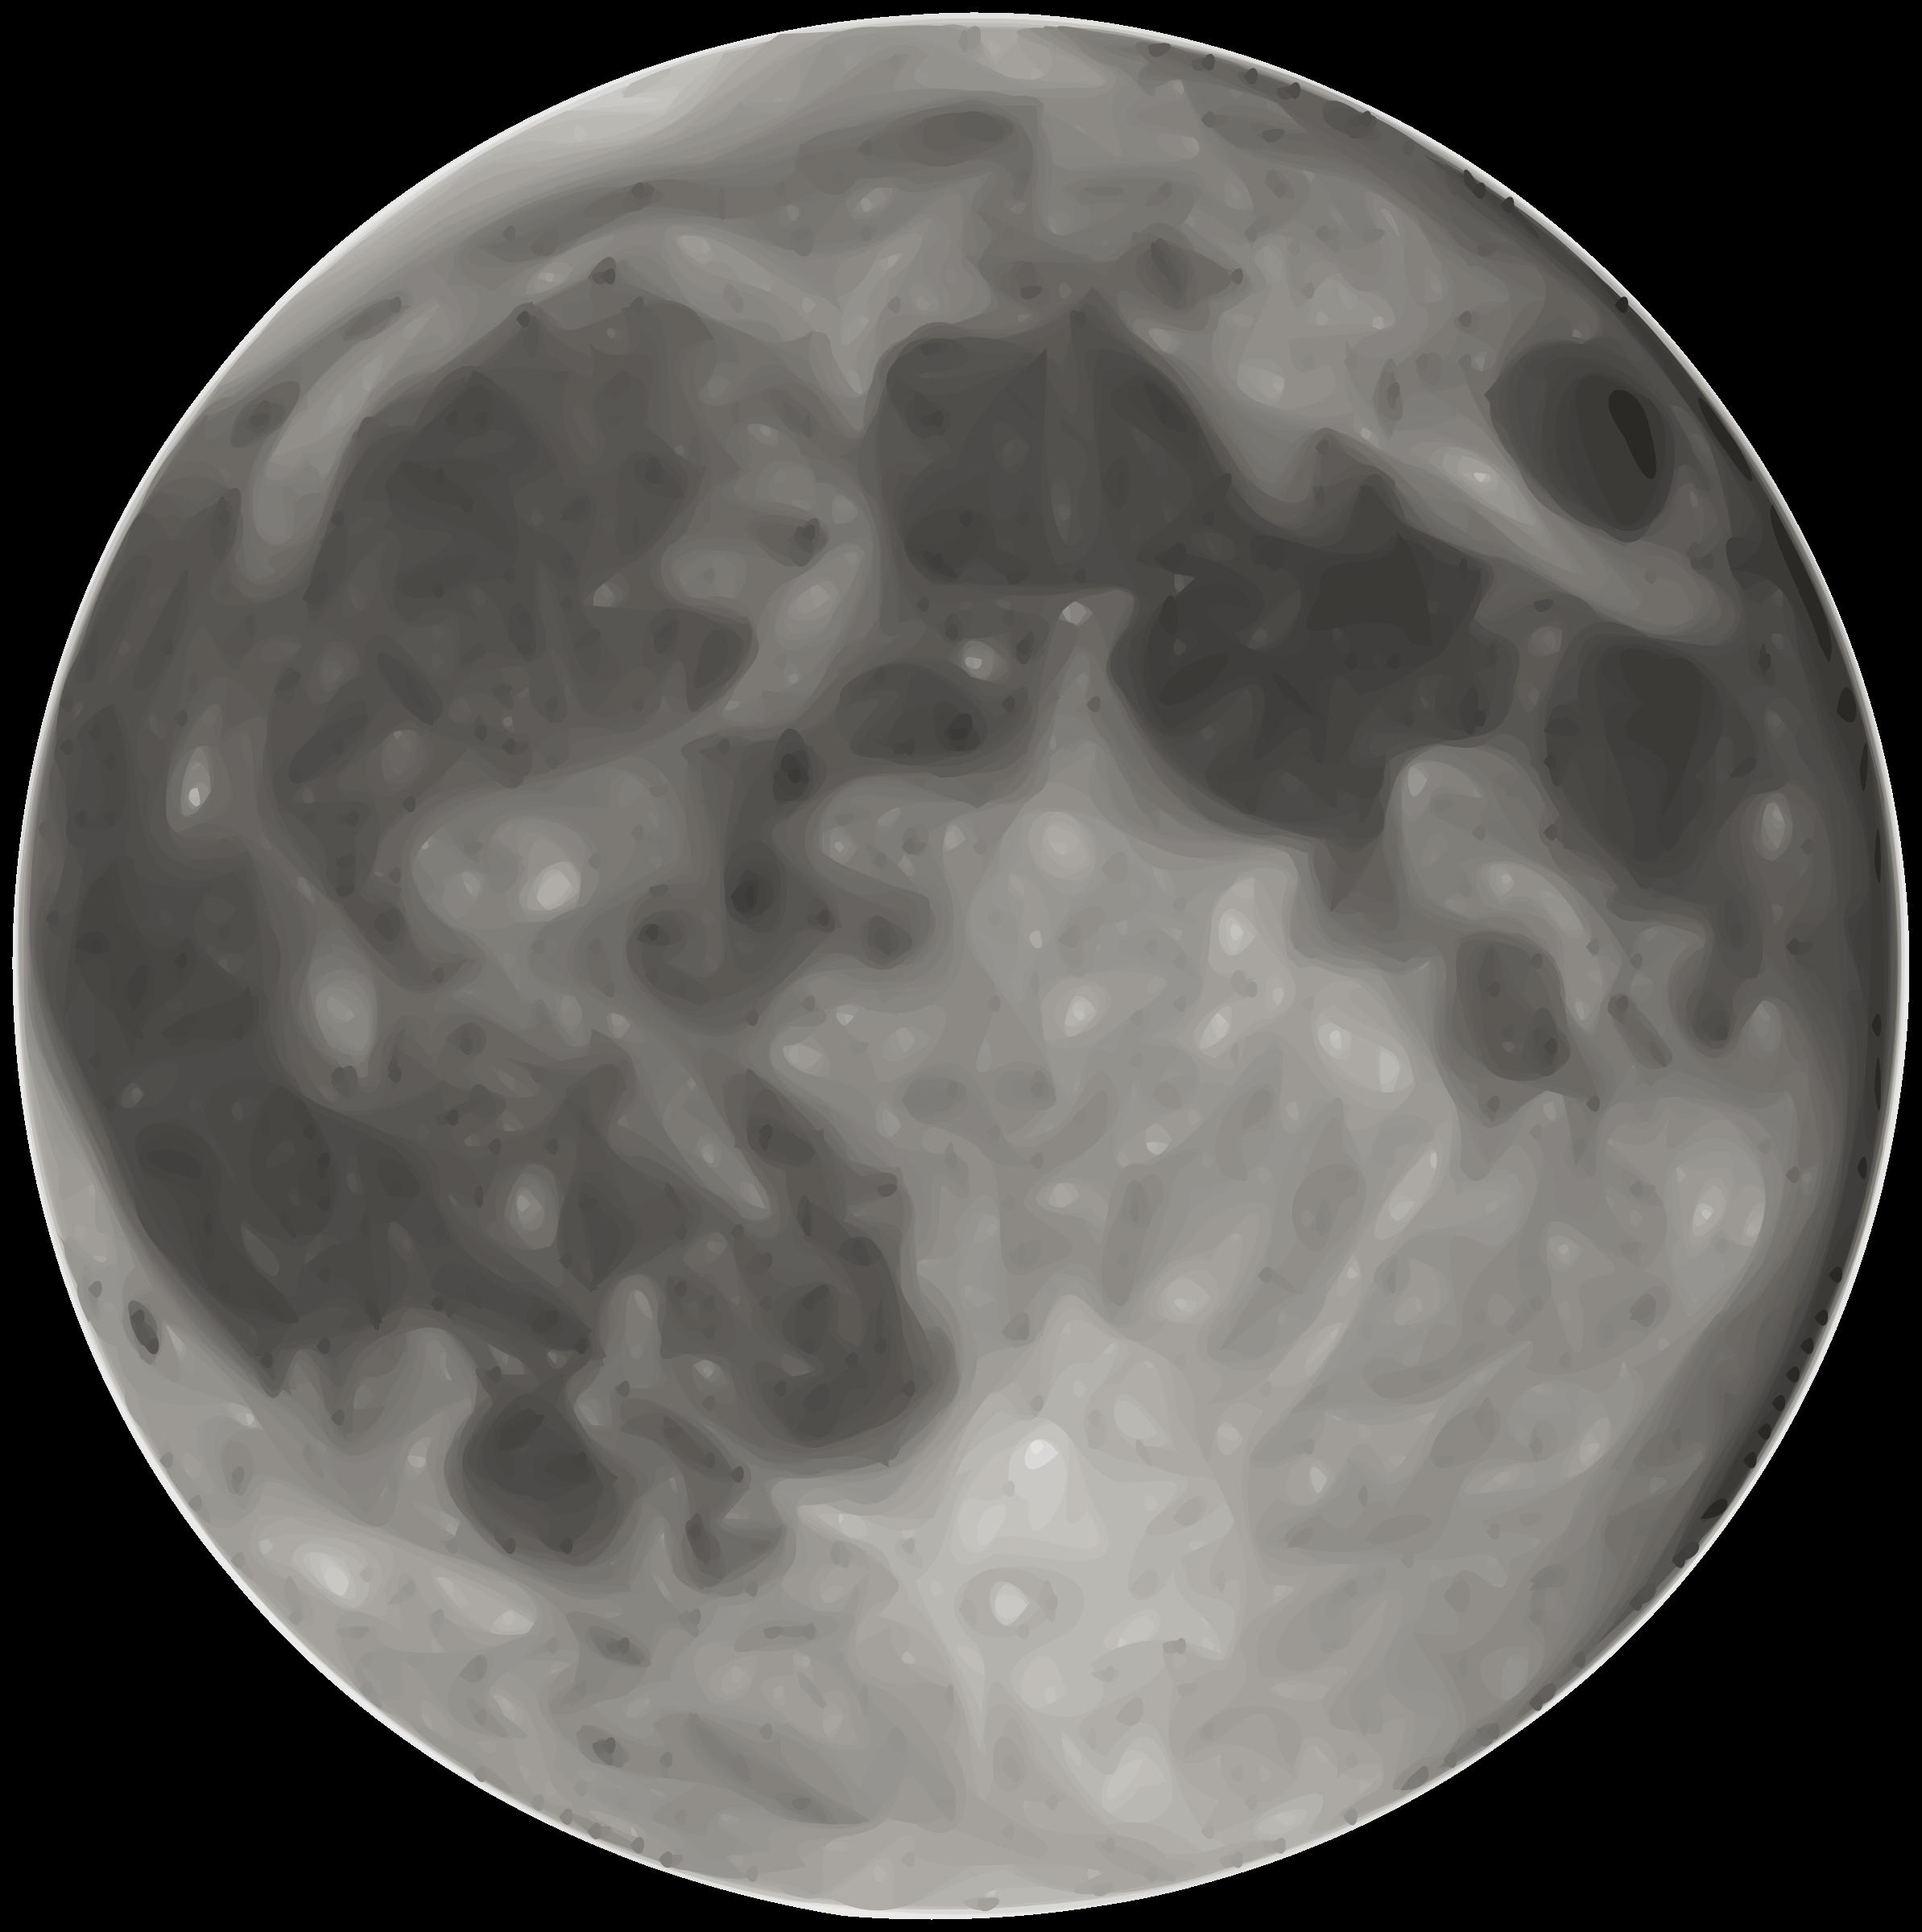 Clipart moon clipart